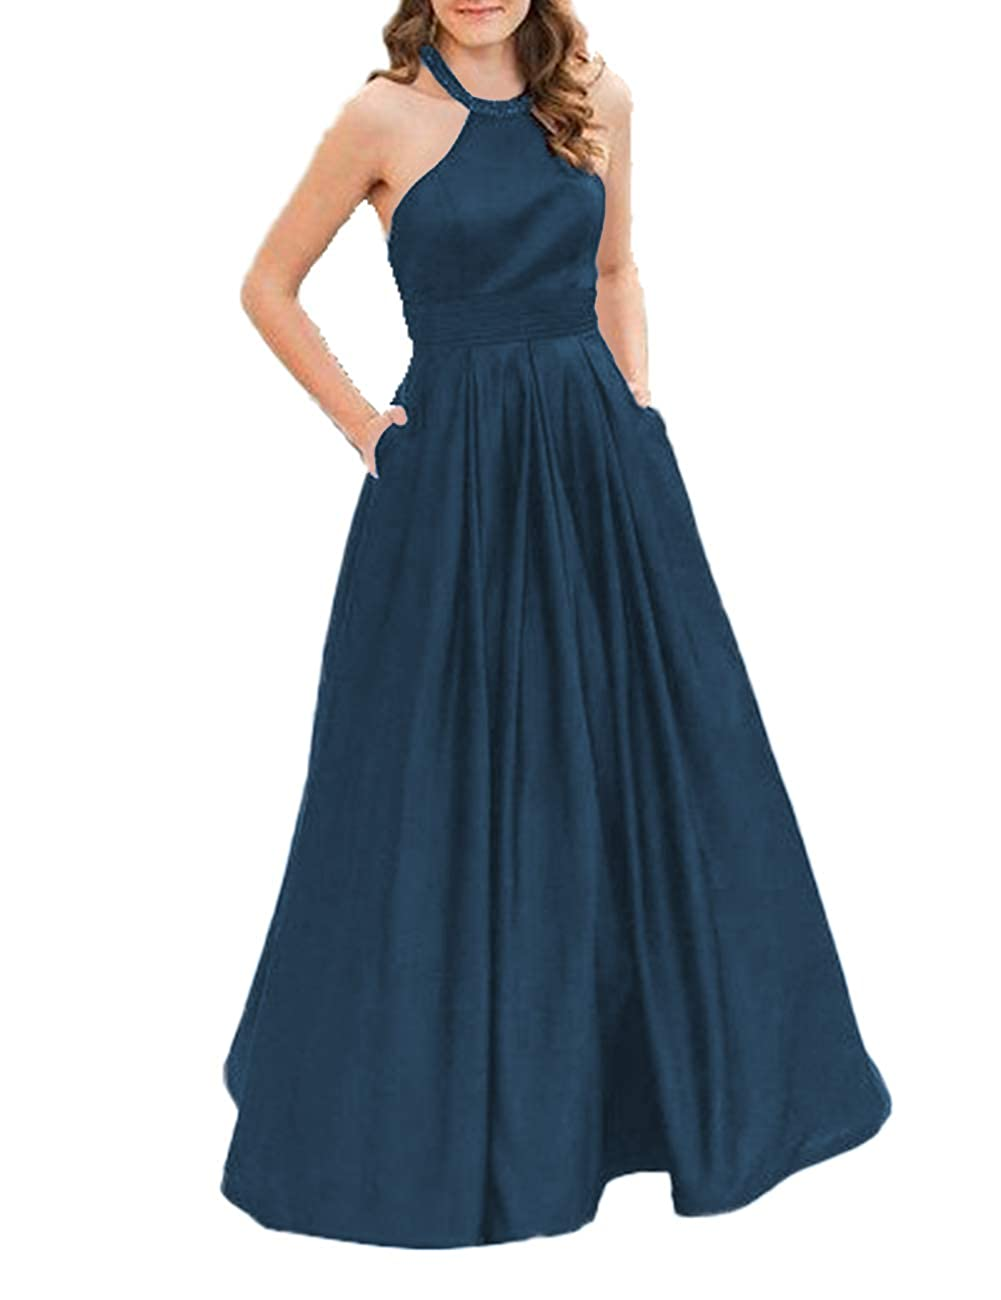 Jade JAEDEN Prom Dress Long Evening Dresses for Women Formal Evening Gowns Halter Prom Dress 2019